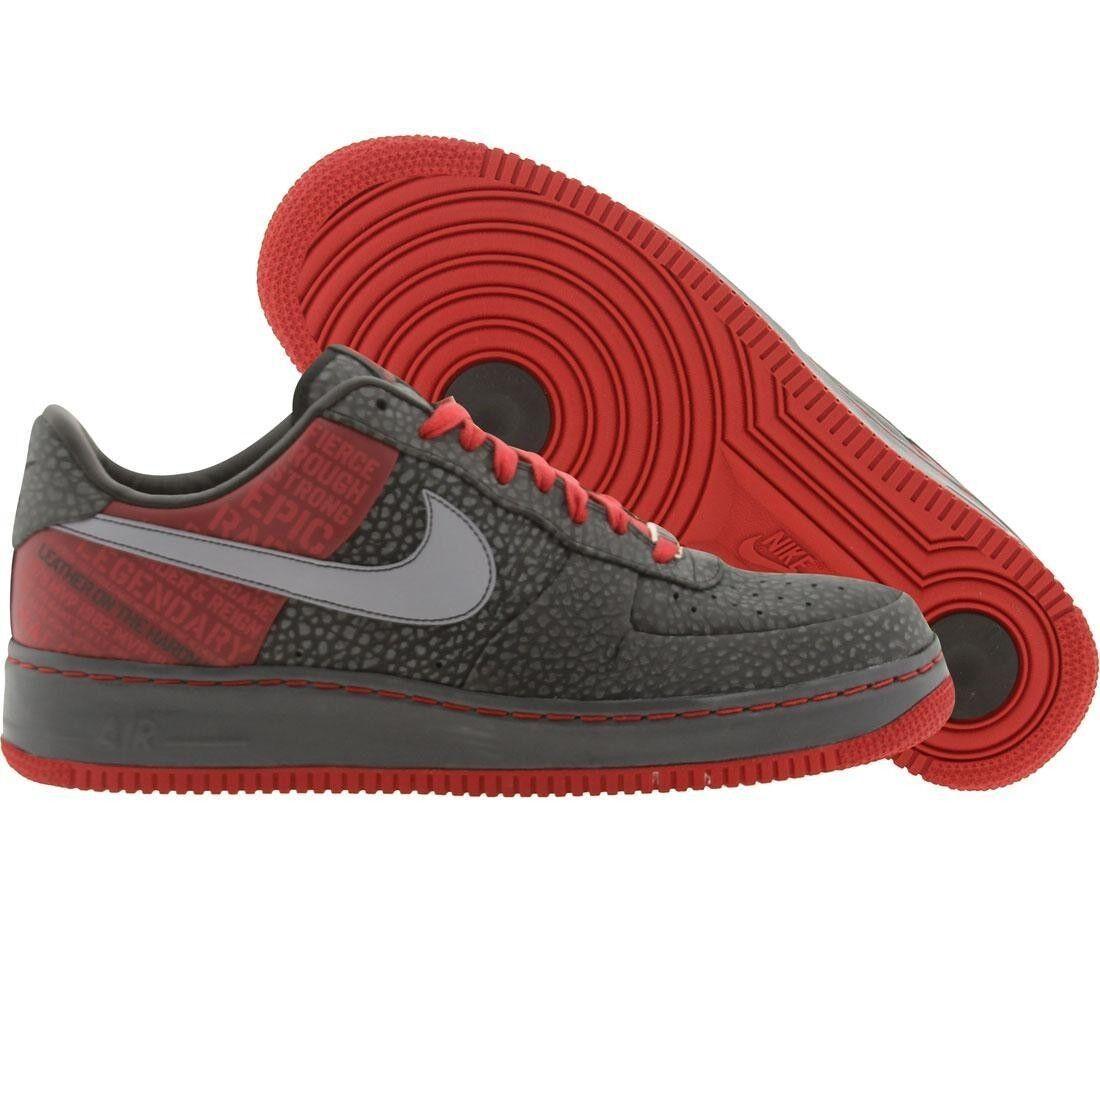 315089-001 Nike Air Force 1 Faible Supreme 07 Original Six-Moses Malone Noir Rouge